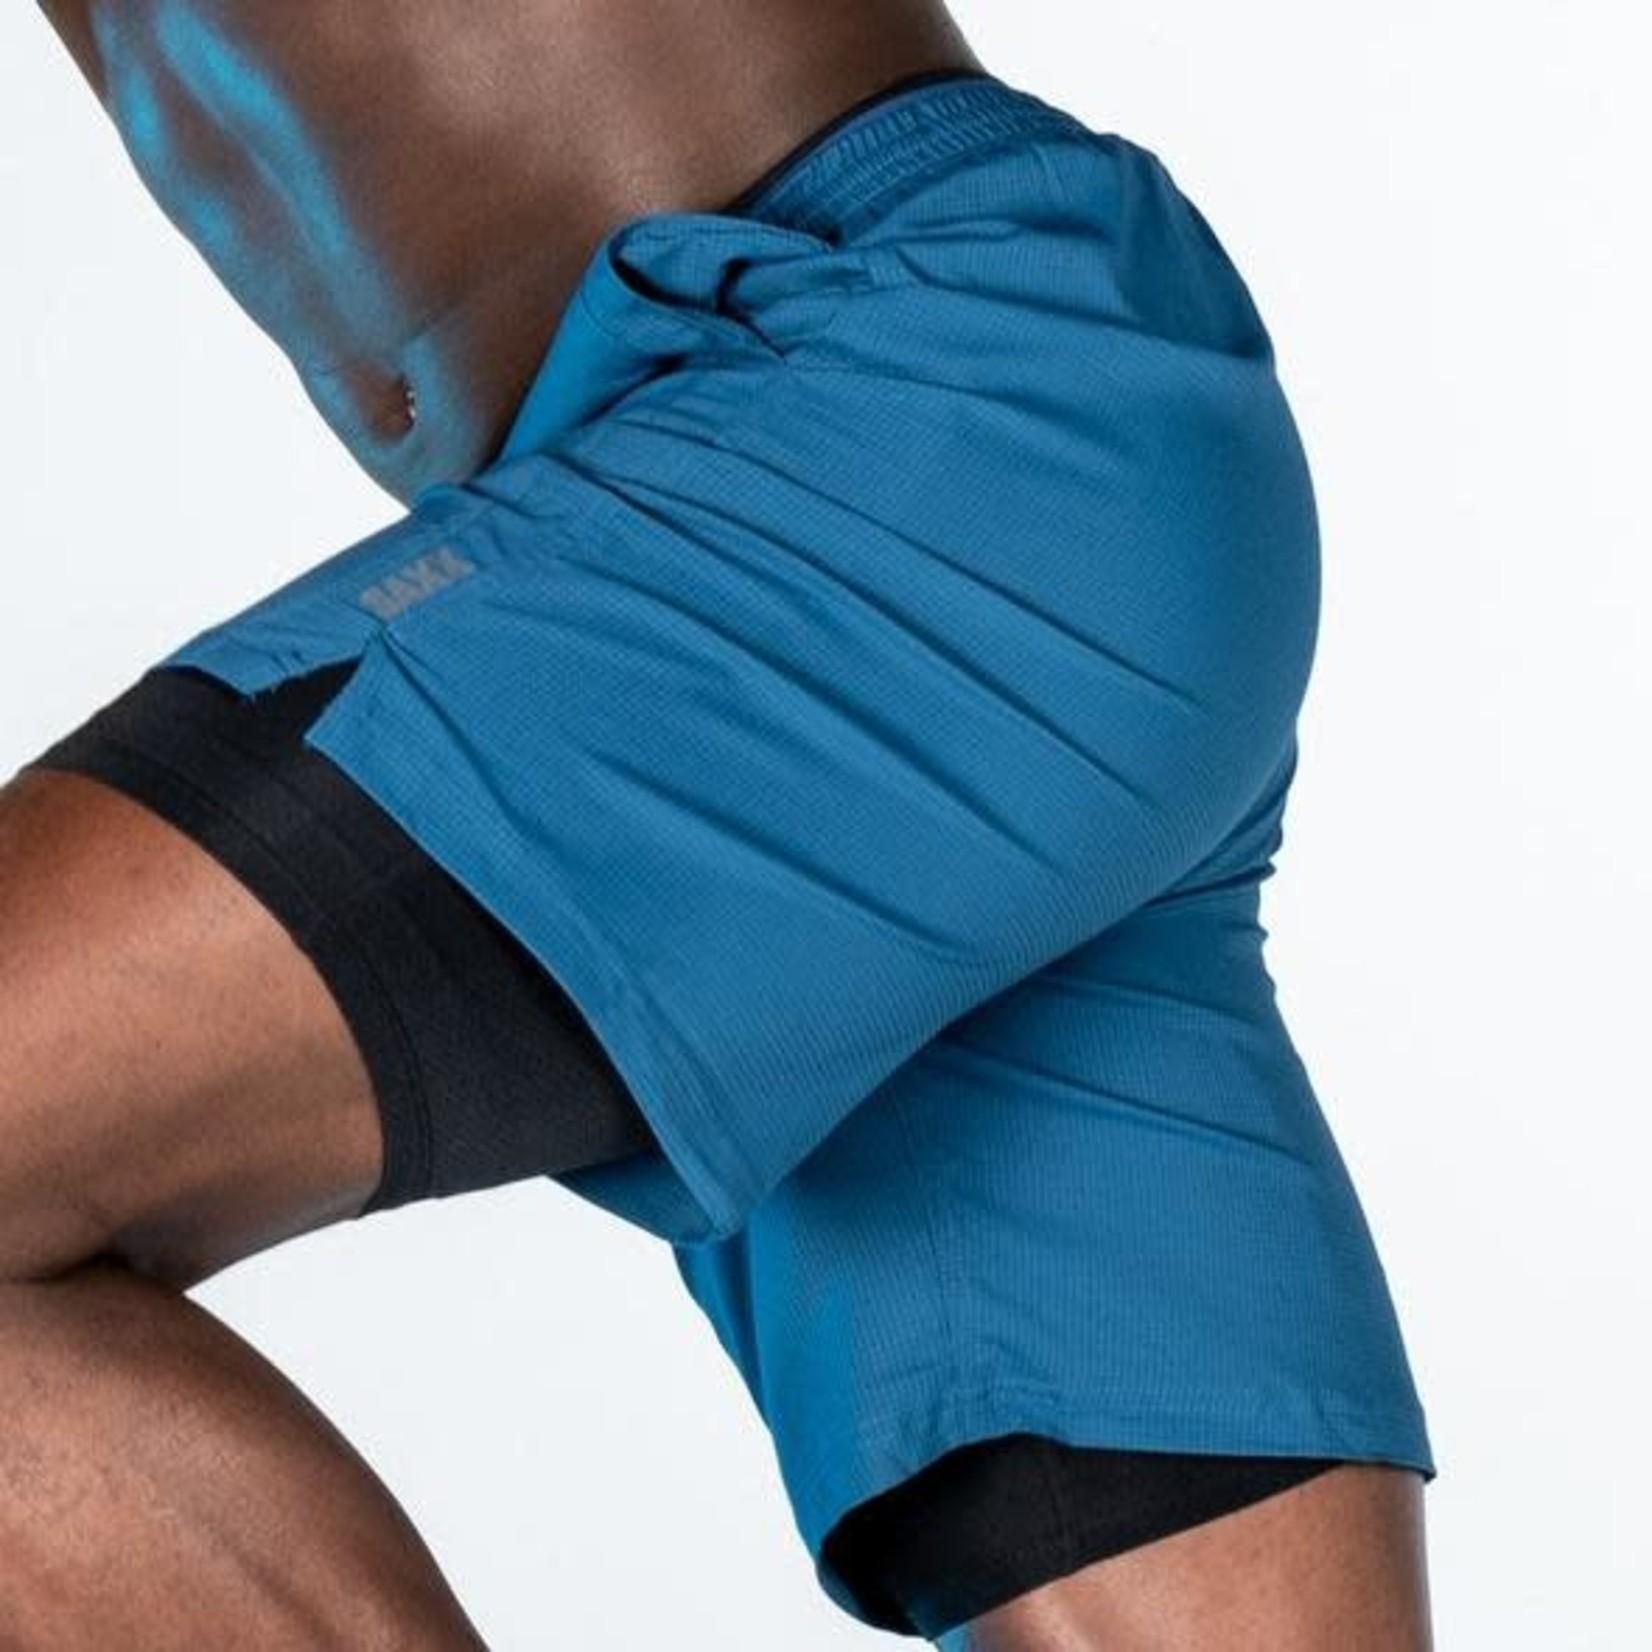 Saxx Saxx Shorts, Kinetic 2N1 Sport, Mens